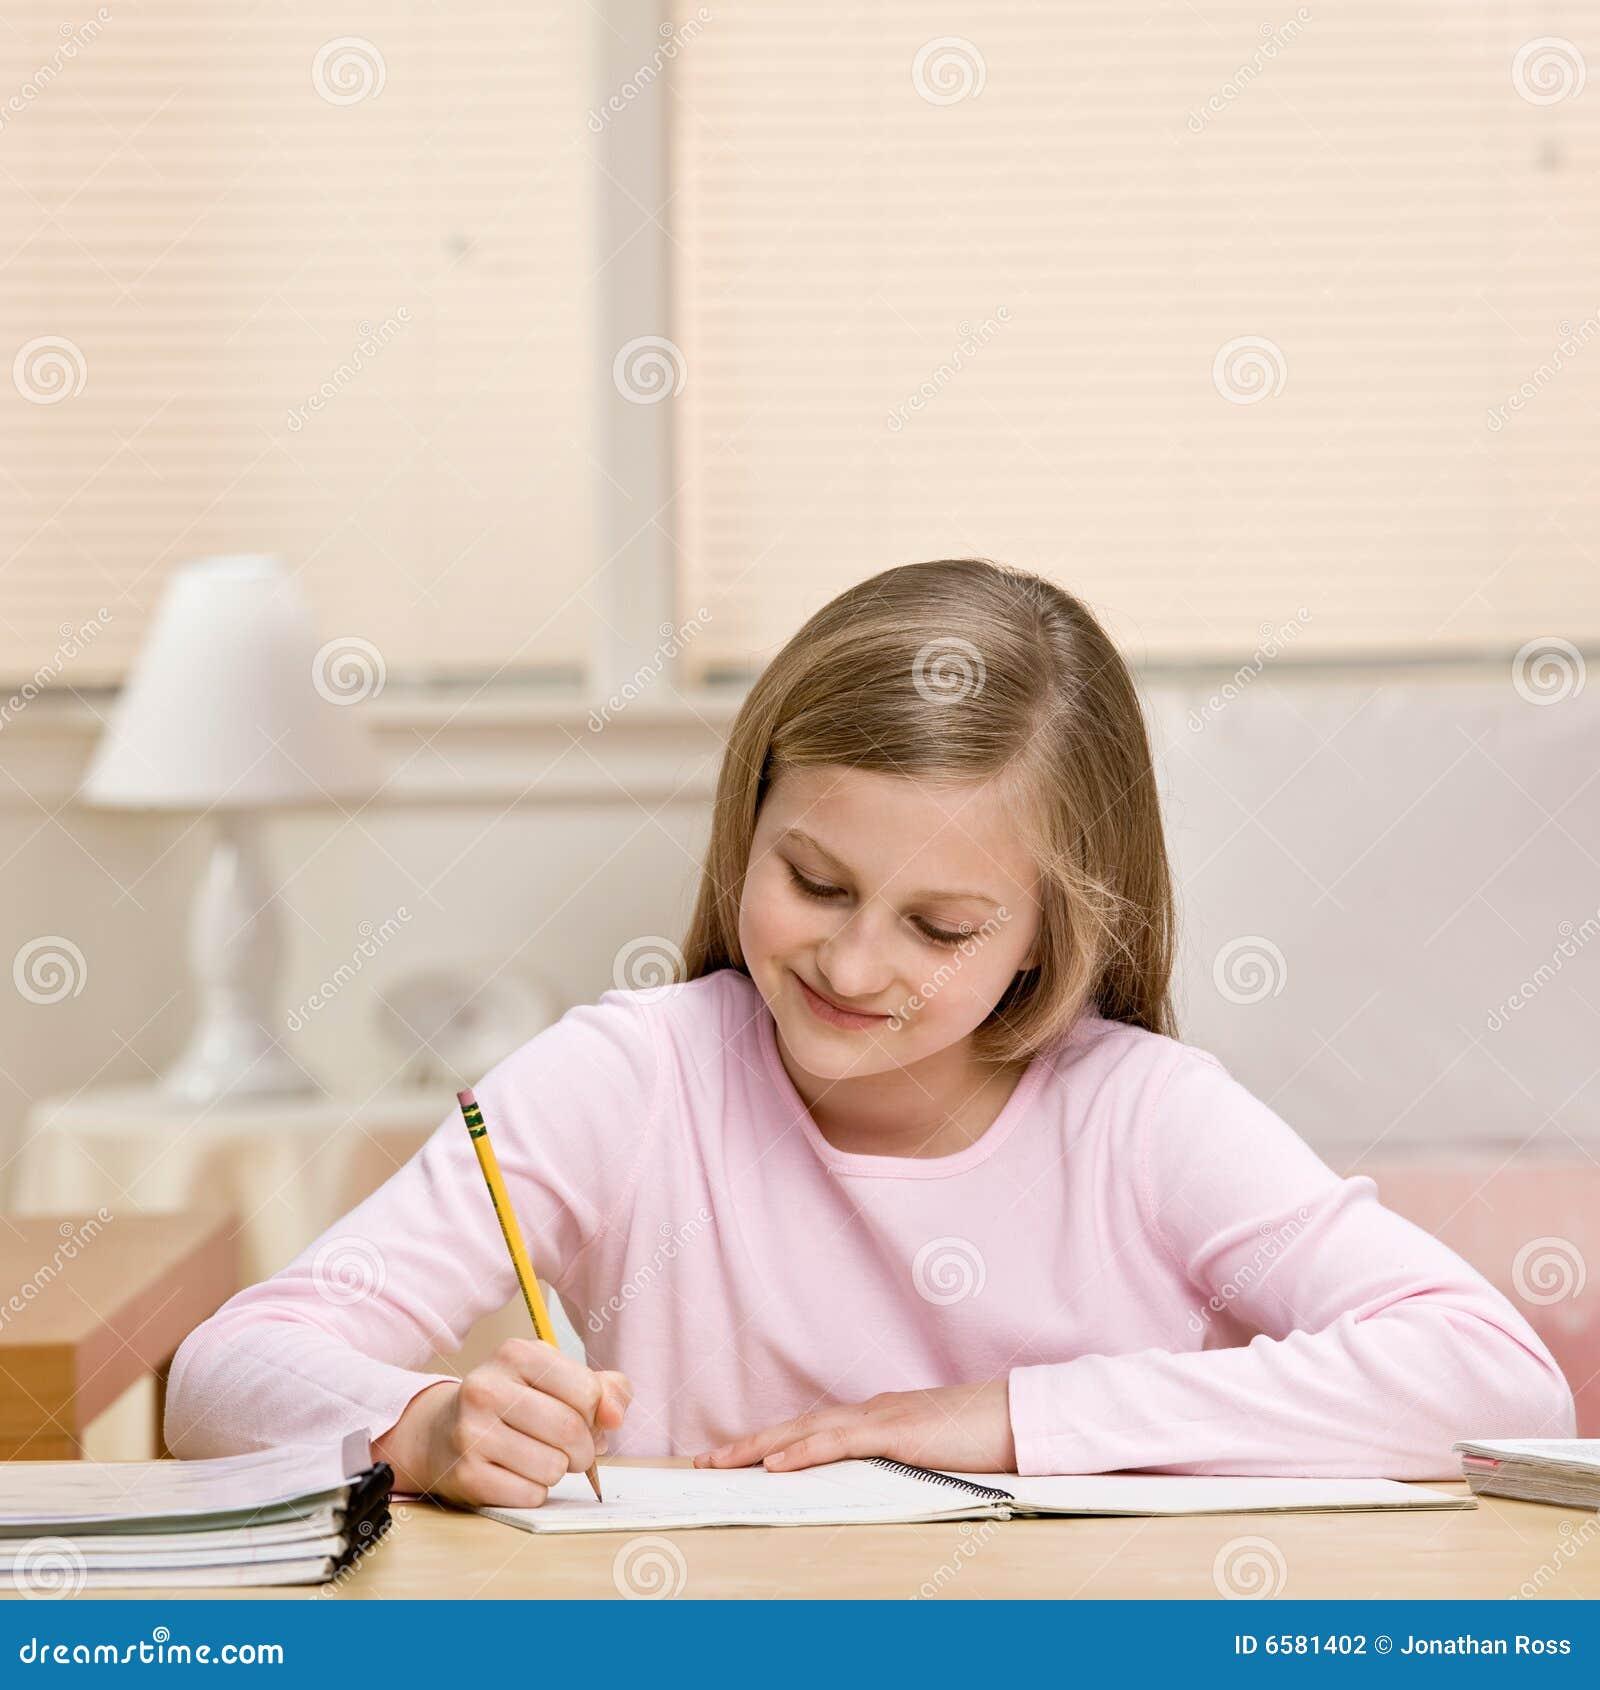 Homework Writing Service